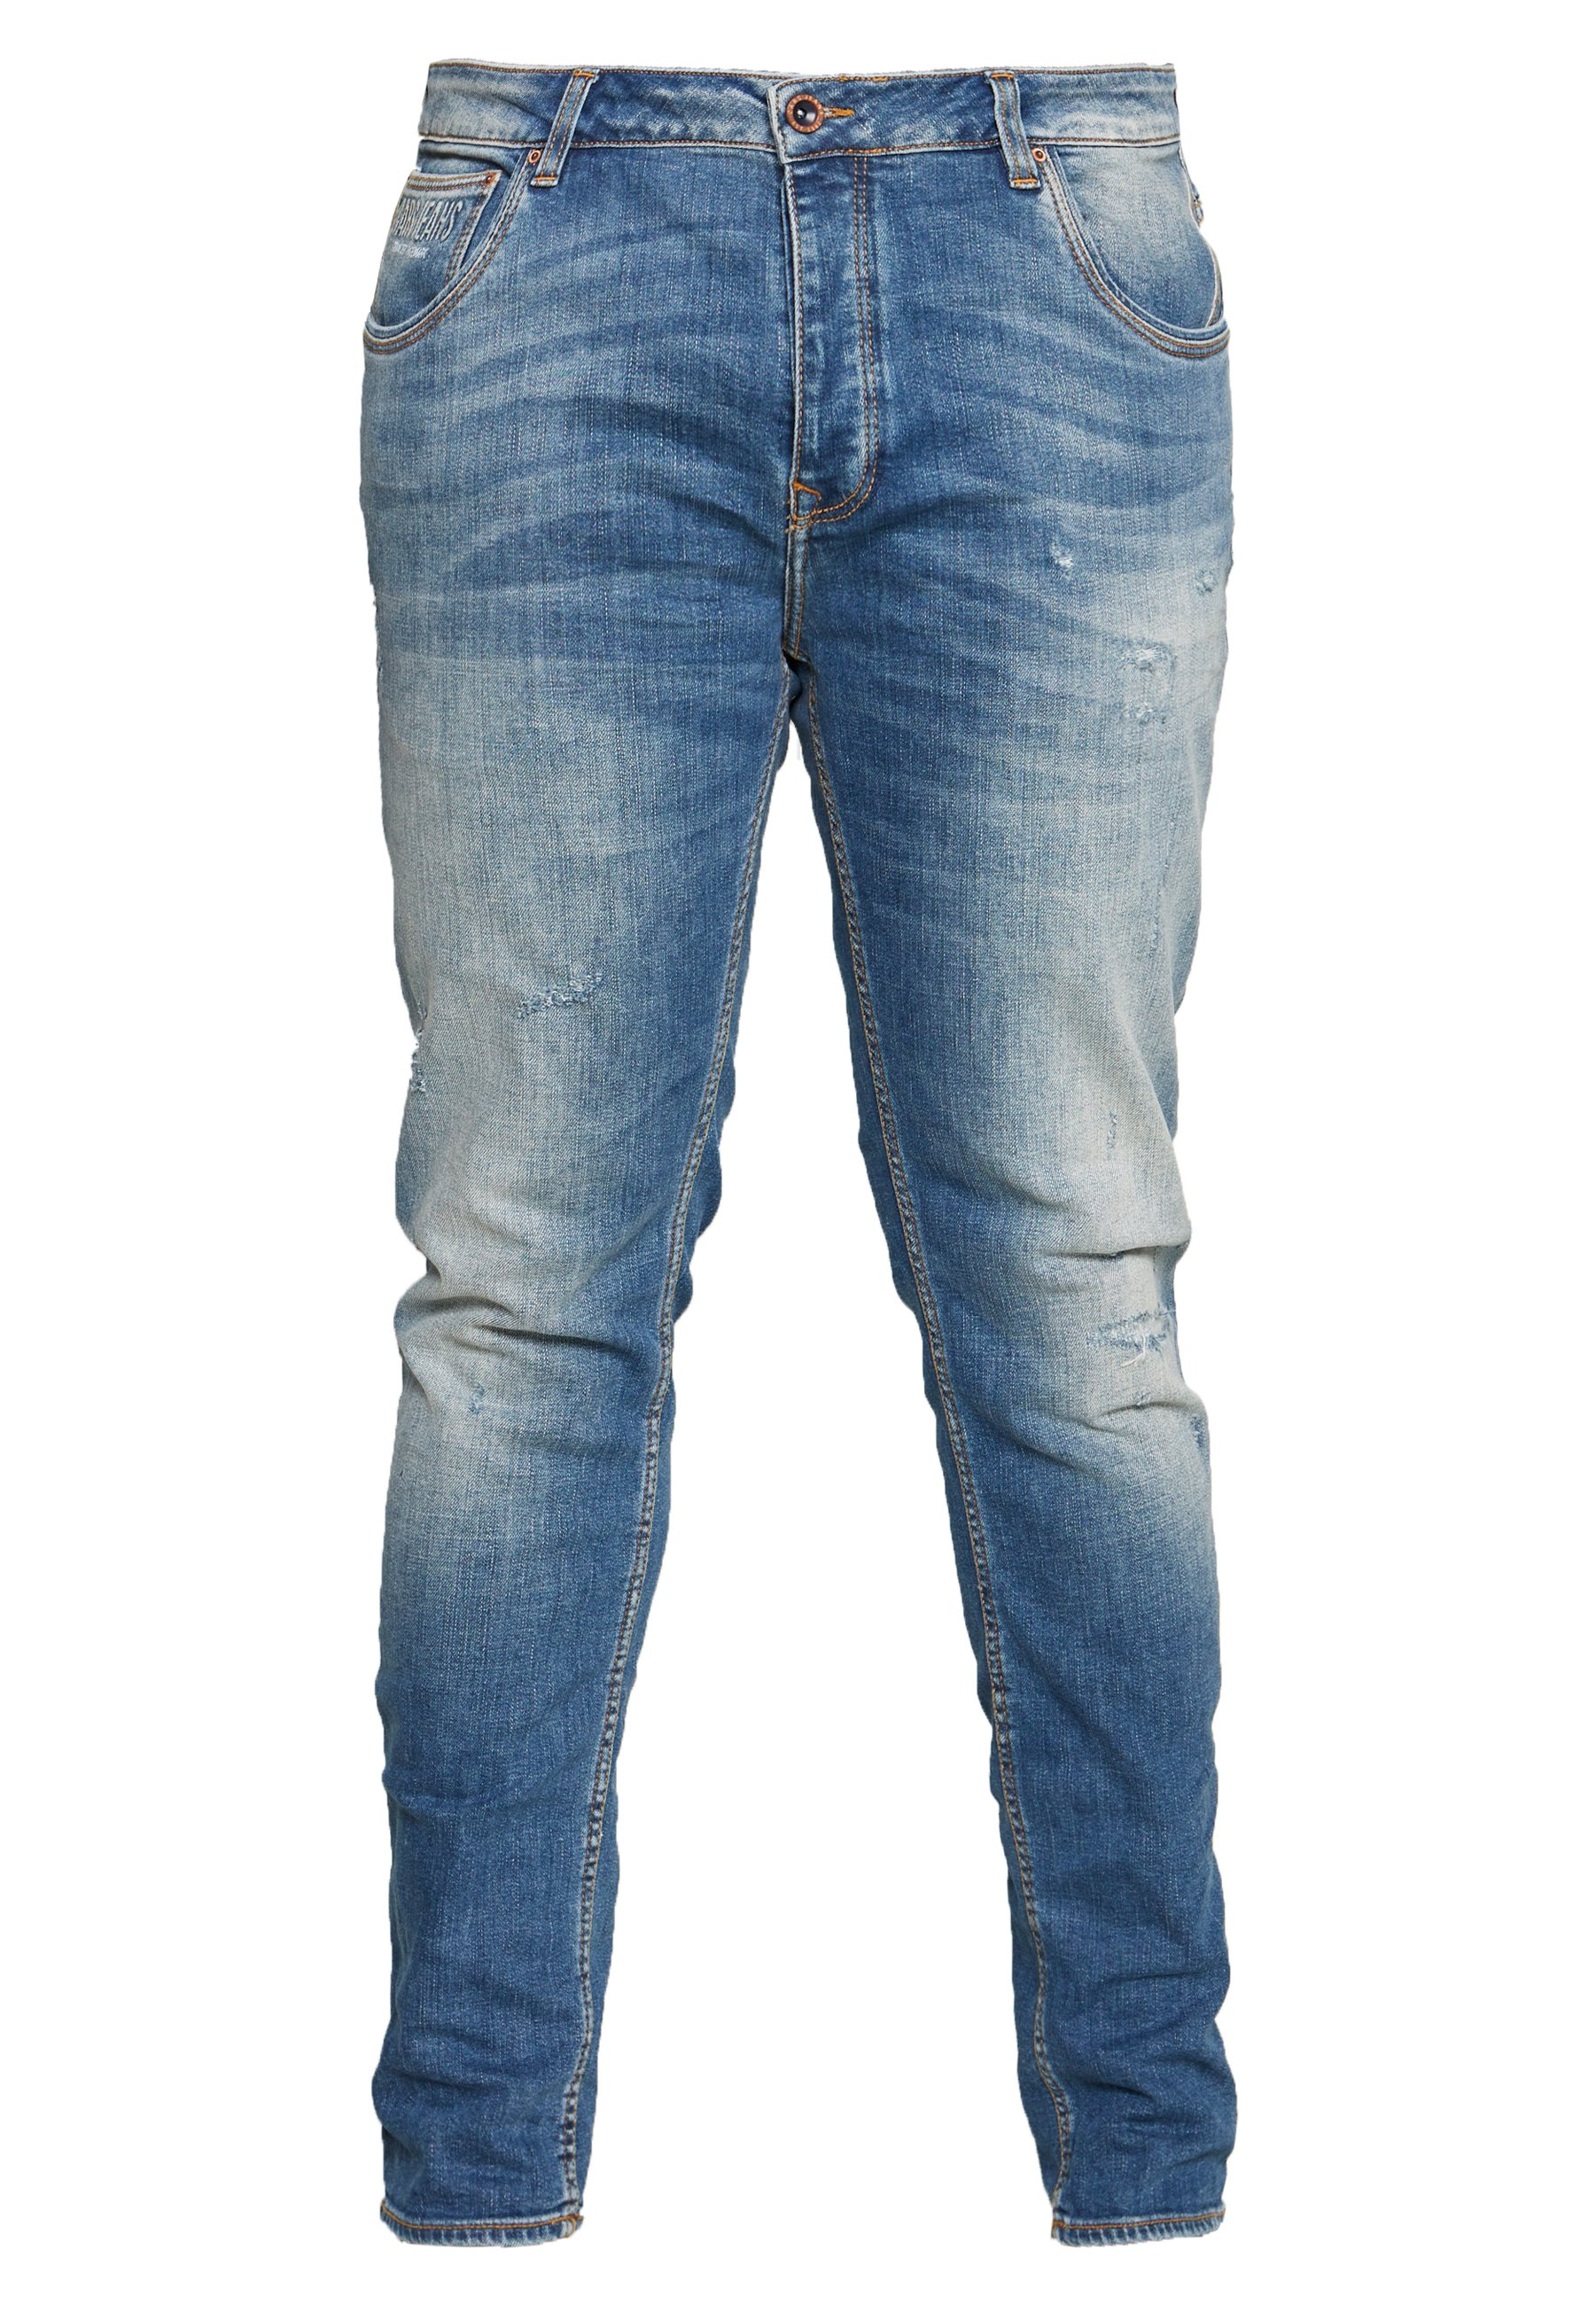 Cars Jeans Stark Plus - Slim Fit Vintage Stone IYtbzjjl J0